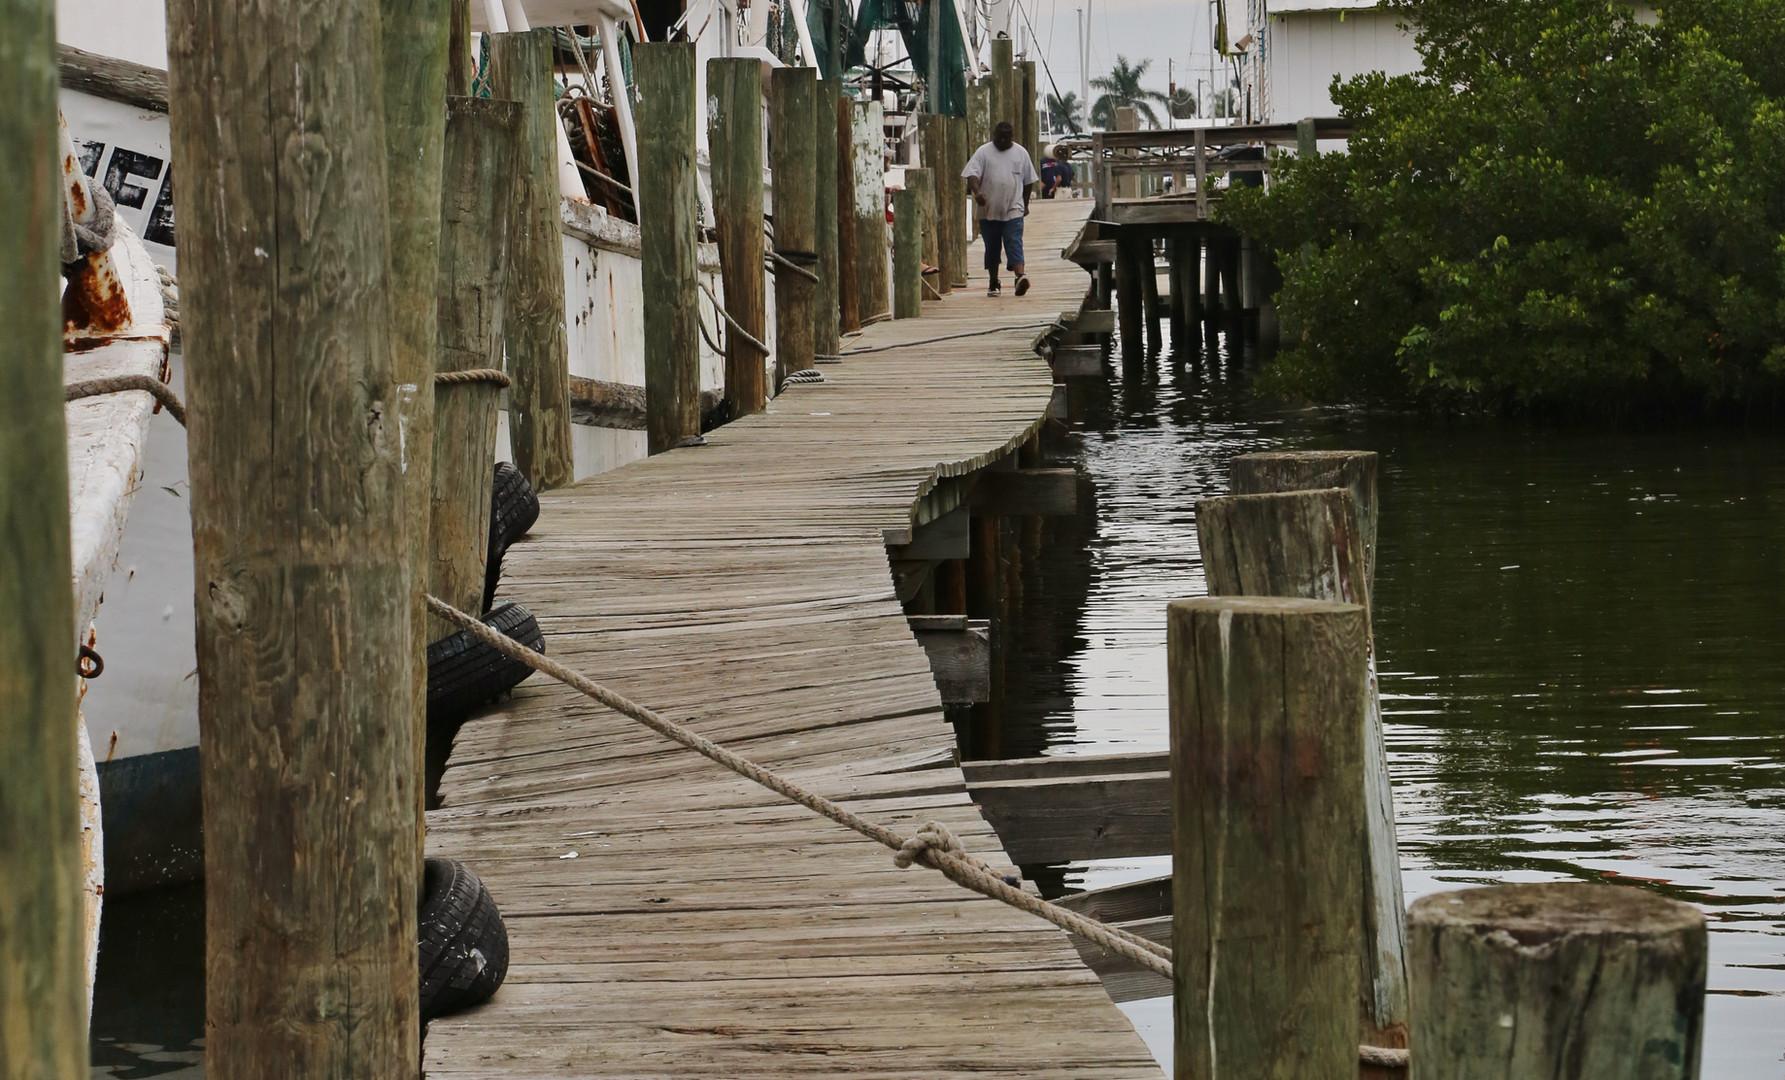 Trico's dock